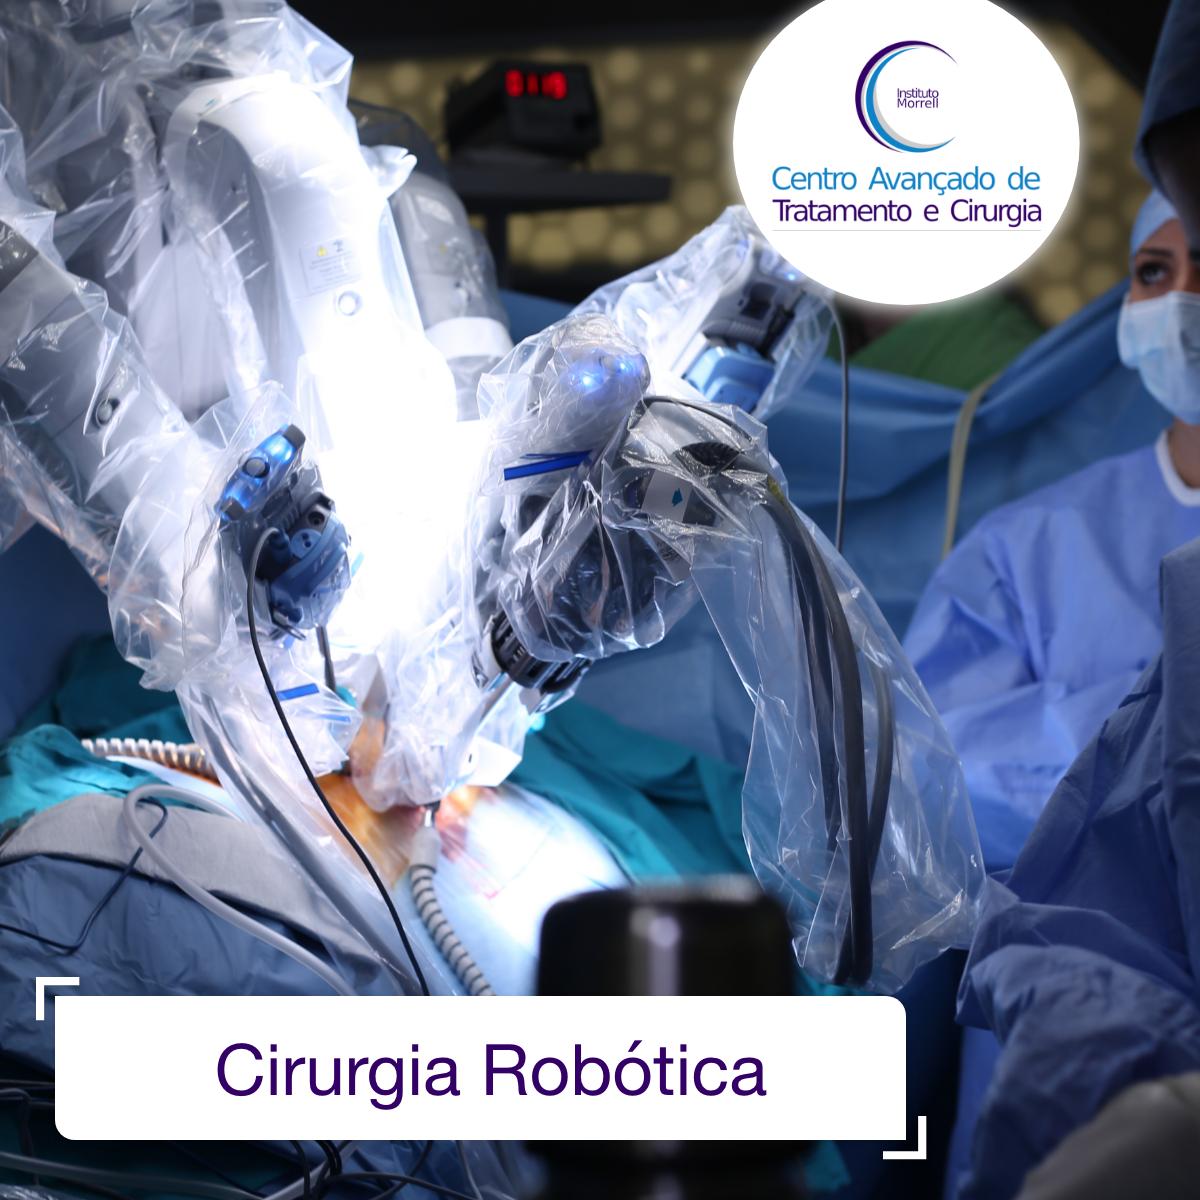 INSTITUTO_MORRELL-2018-Cirurgia_Robótica-1-1200x1200.png